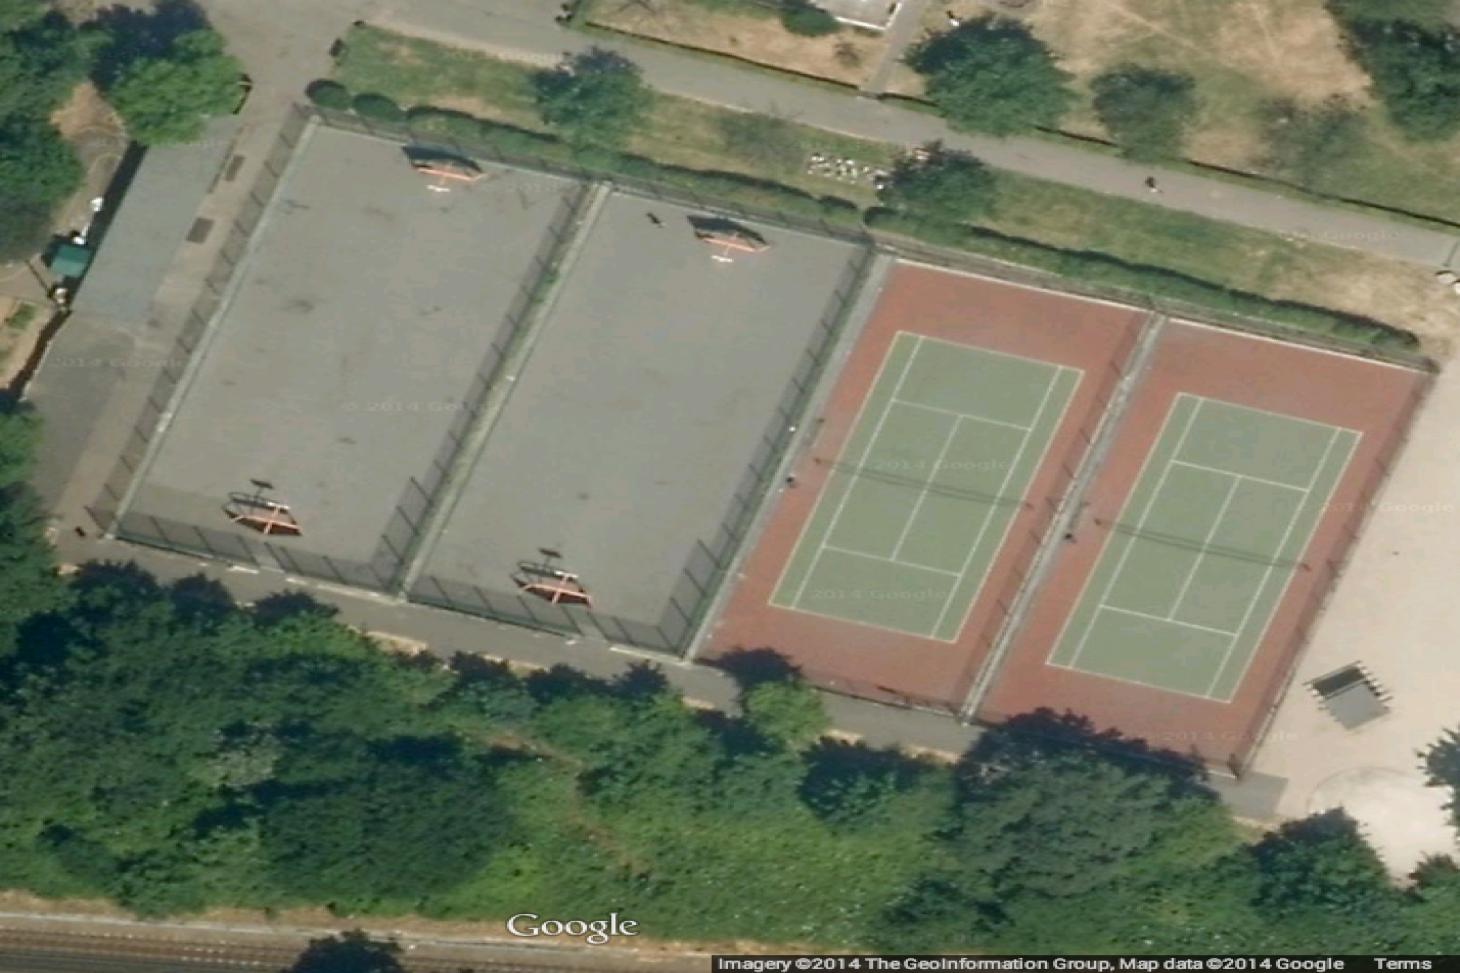 Hillside Gardens 5 a side | Concrete football pitch